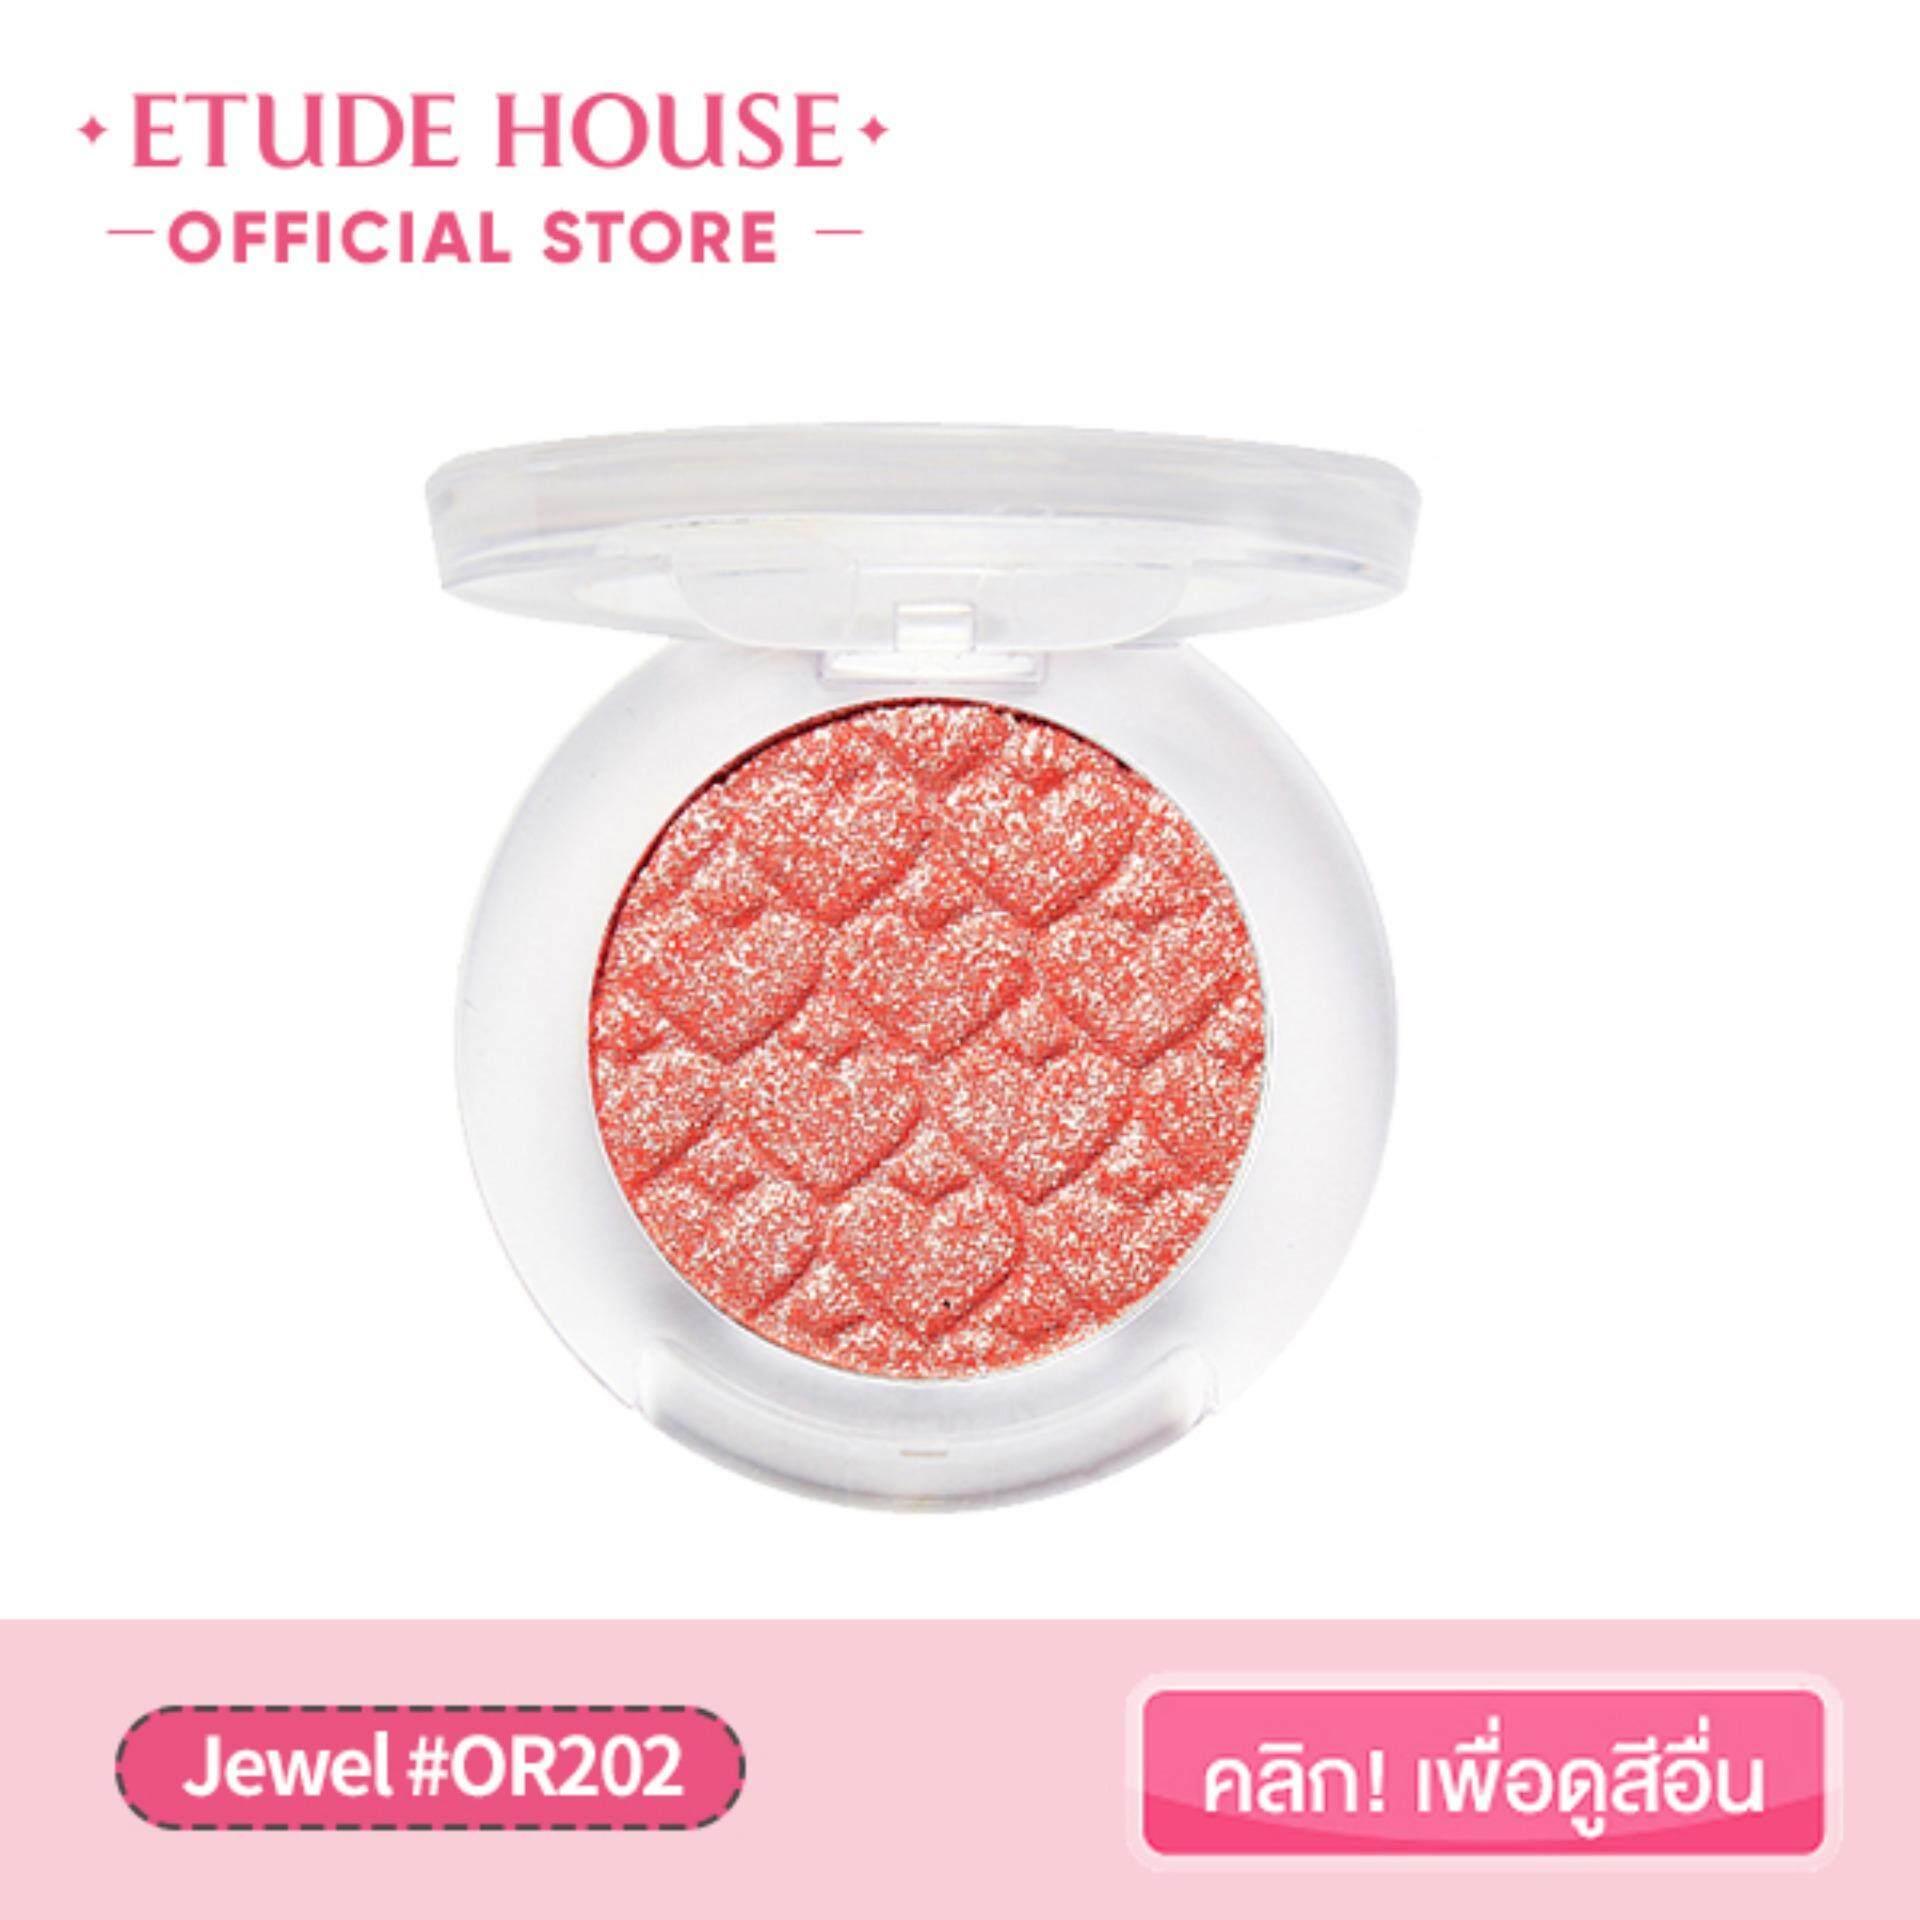 ETUDE HOUSE Look At My Eyes Jewel (2 g)